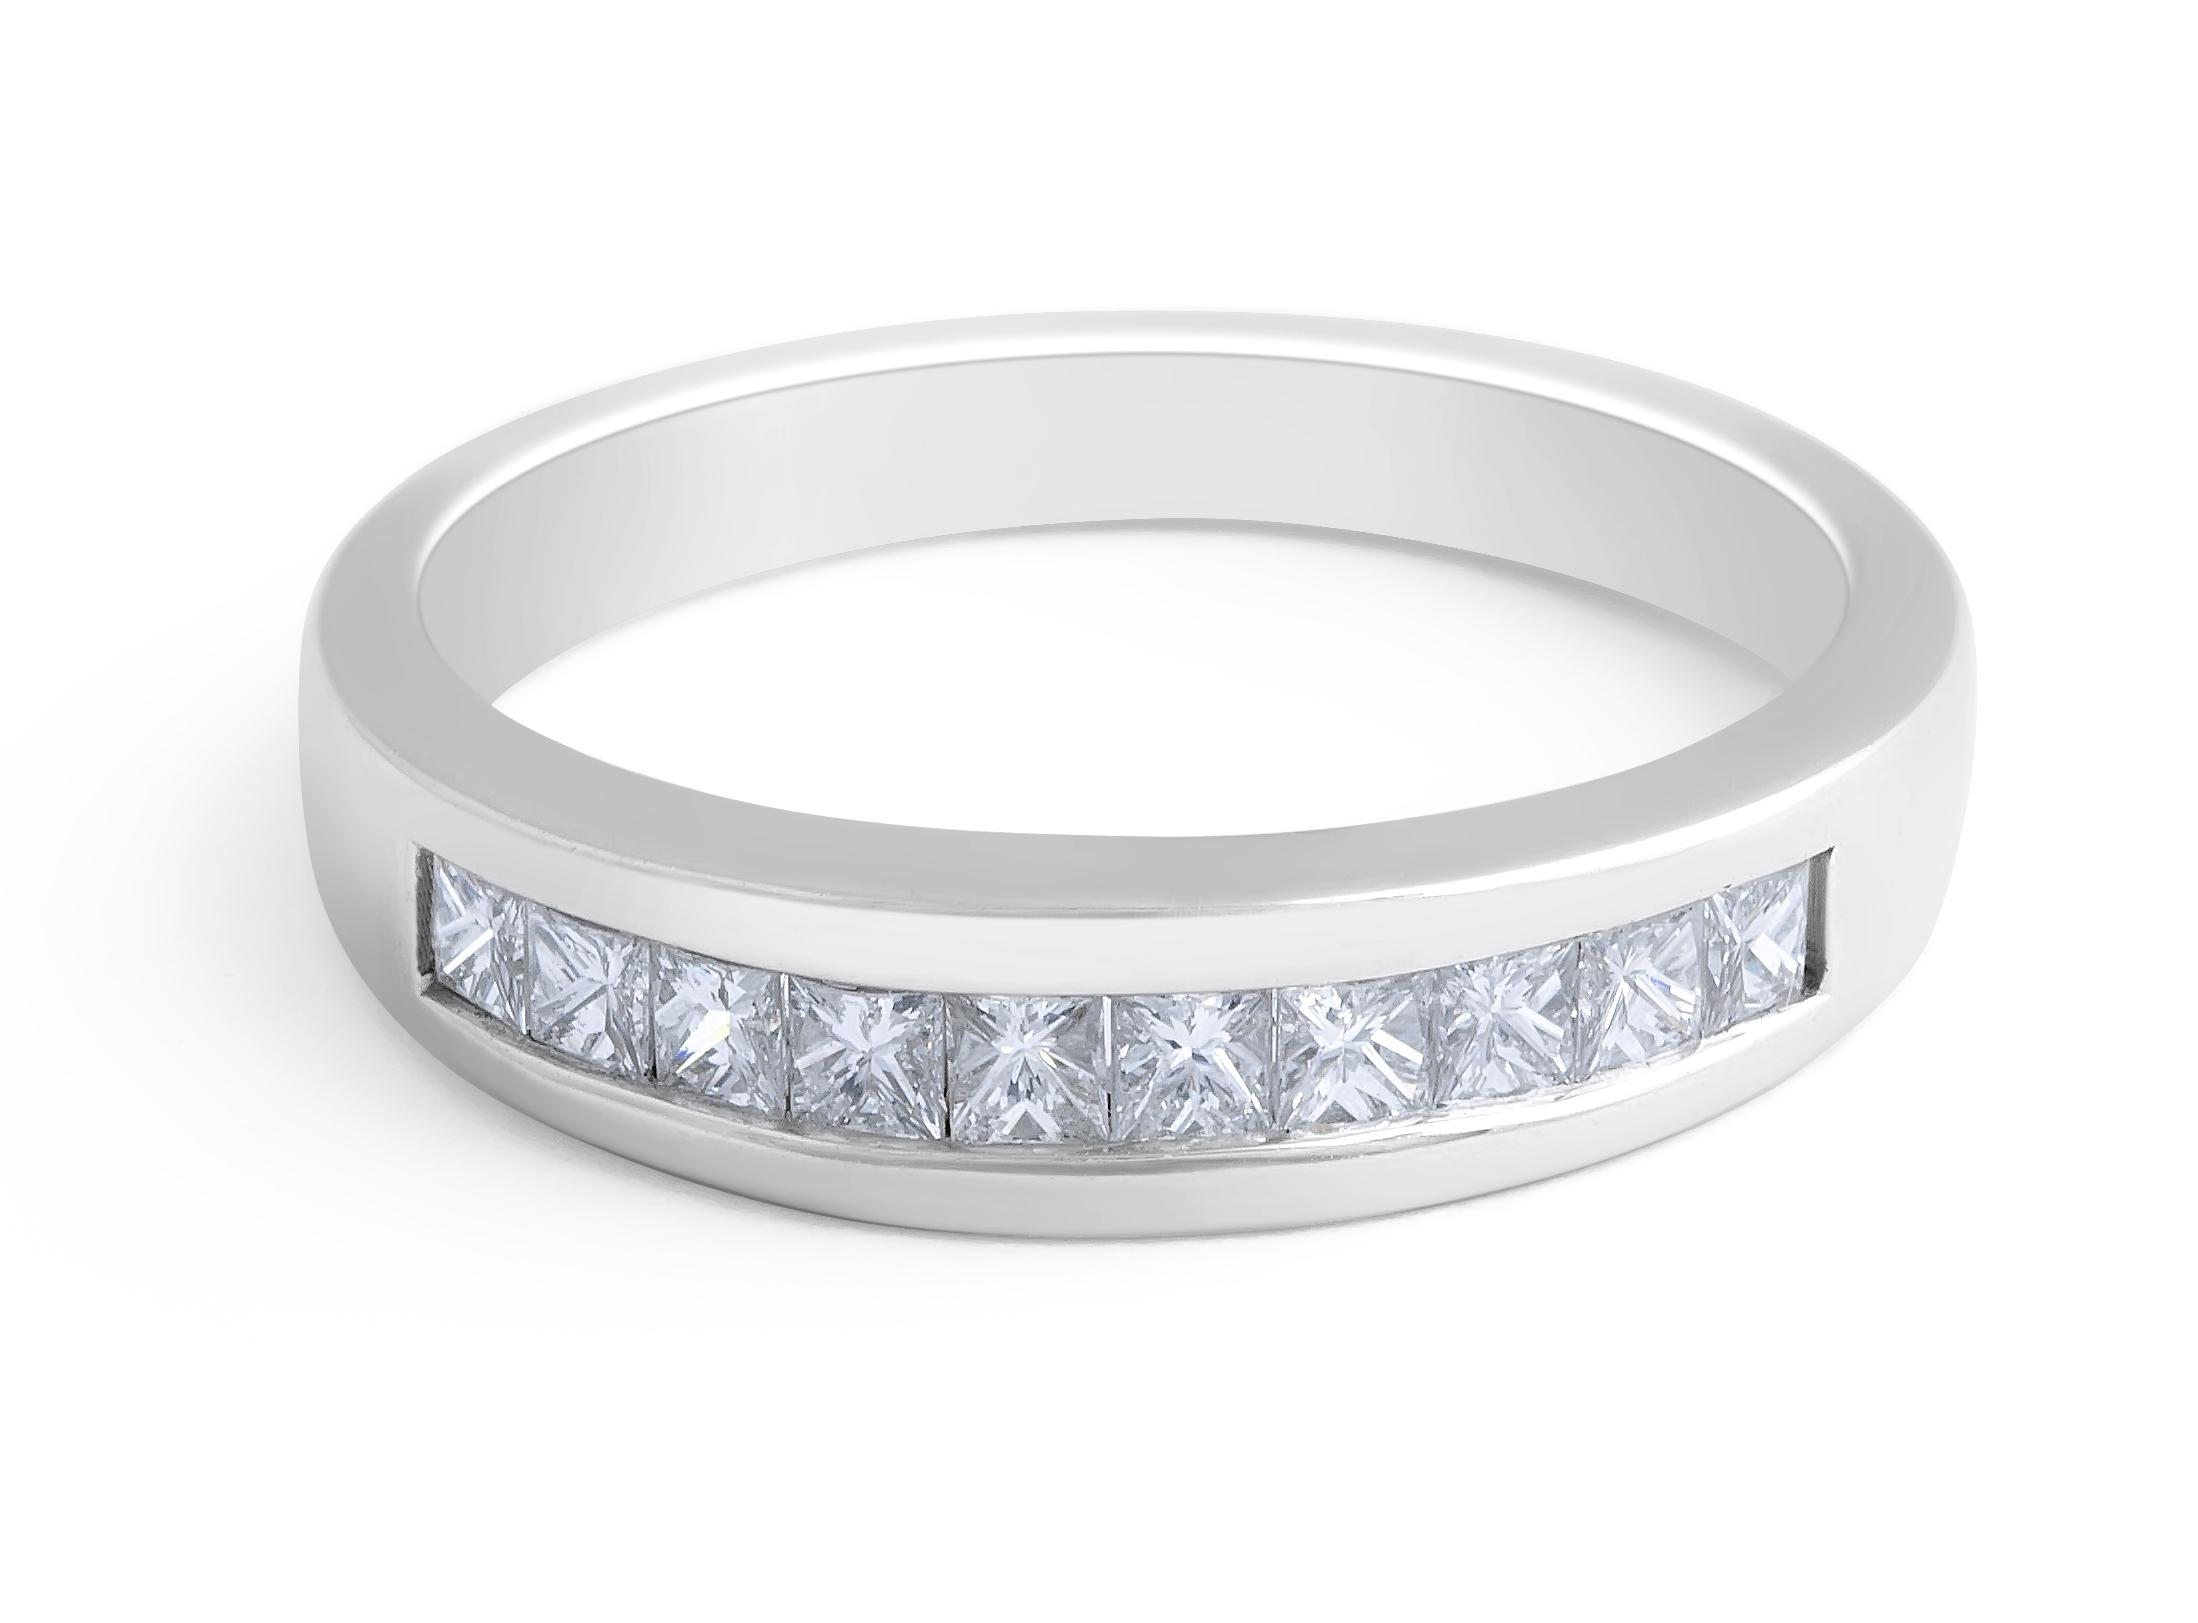 18 Karat White Gold Diamond Wedding Band - womens wedding band